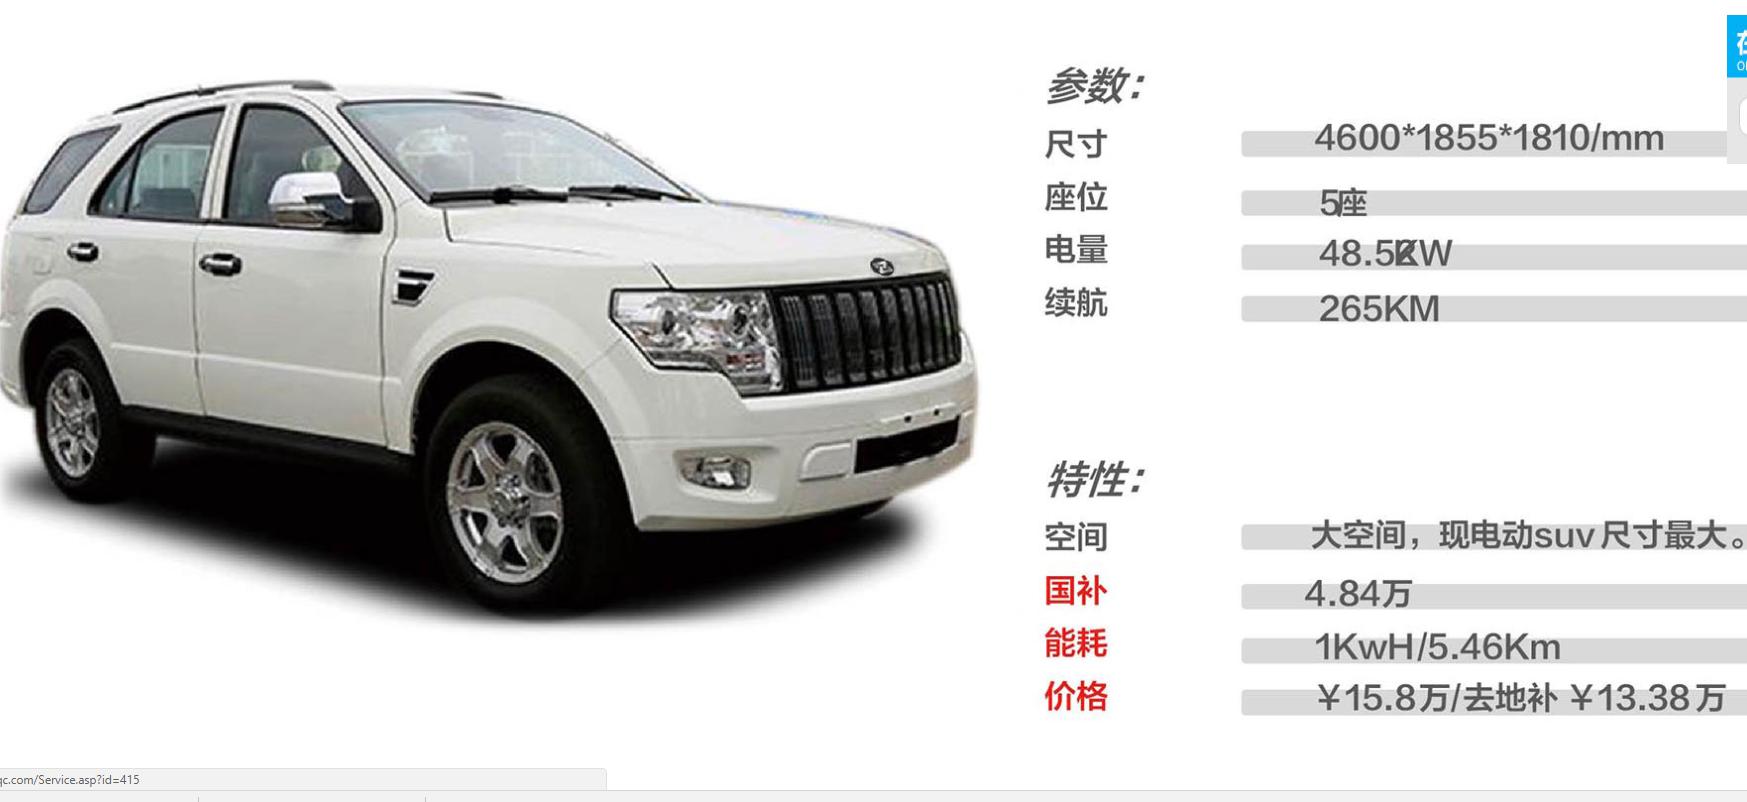 EV1_SUV_7.png